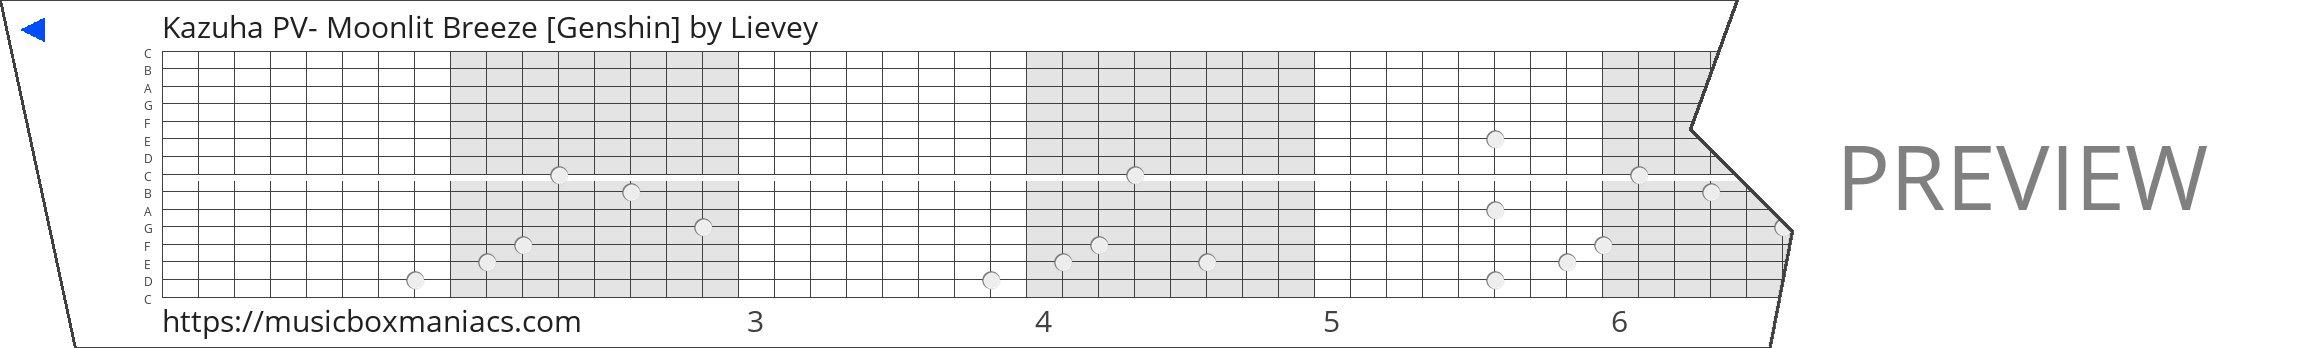 Kazuha PV- Moonlit Breeze [Genshin] 15 note music box paper strip